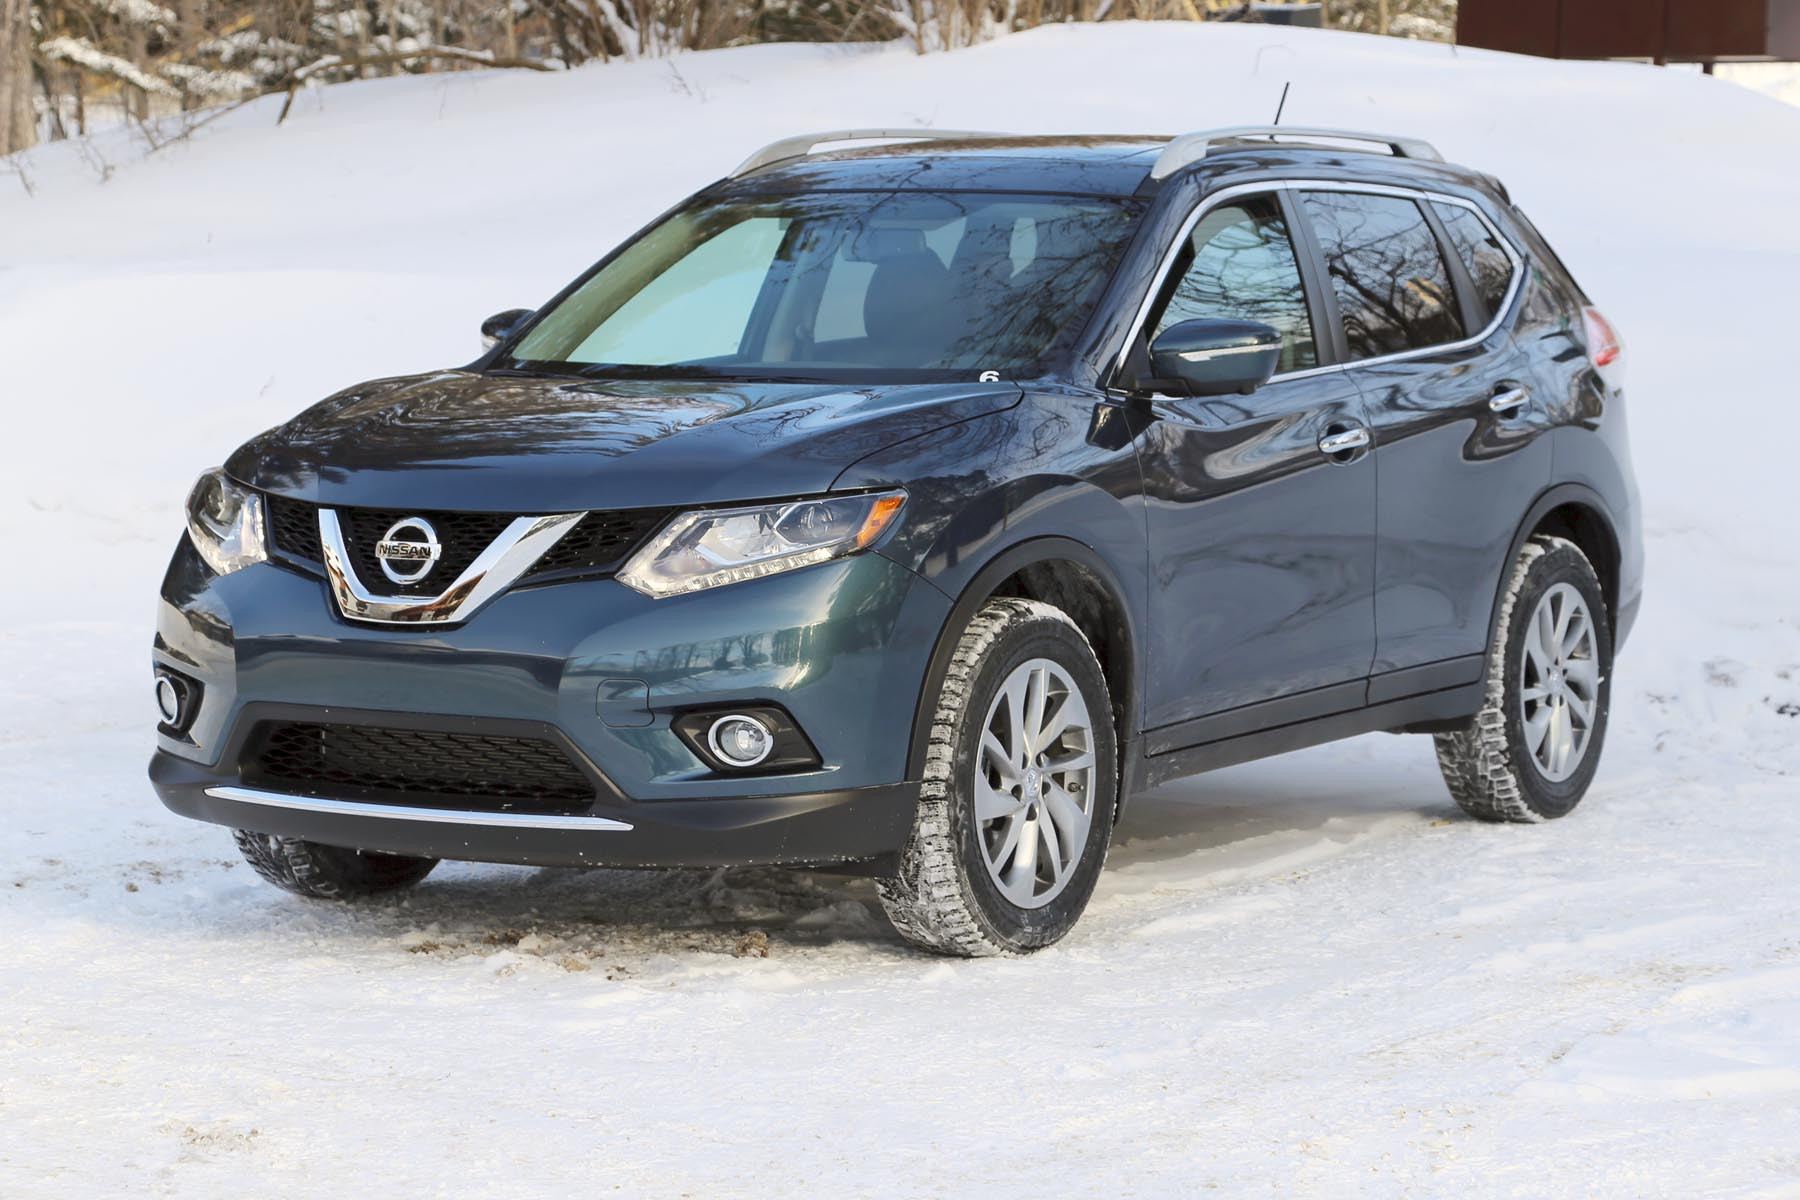 First Drive: 2014 Nissan Rogue